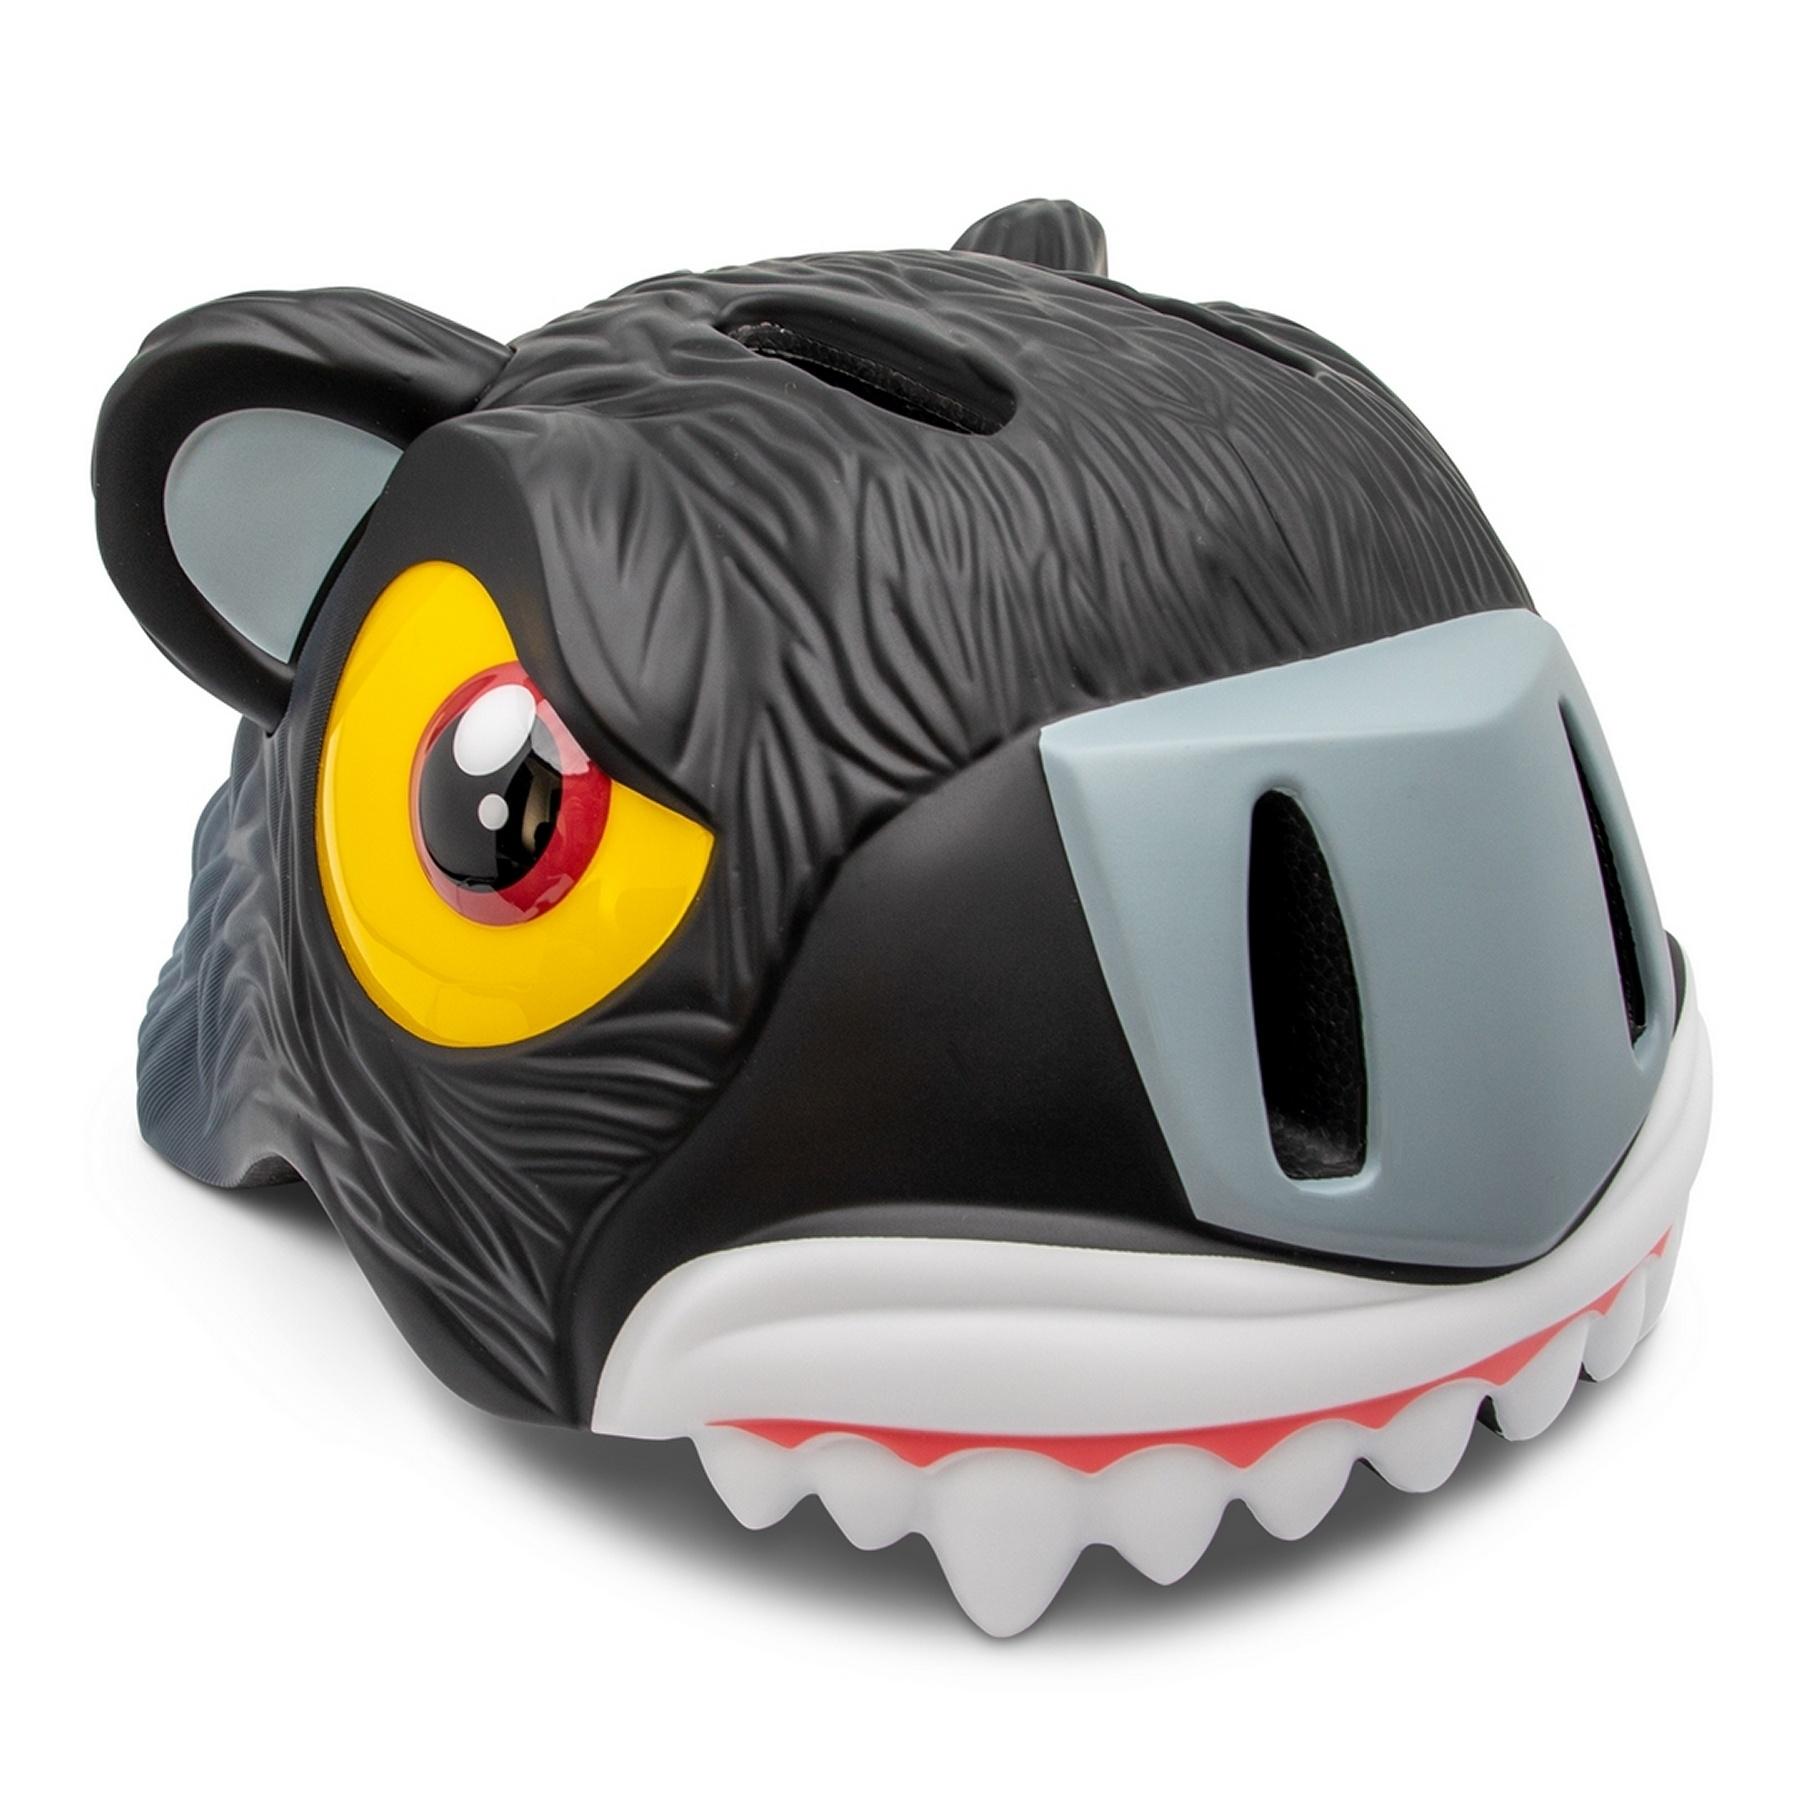 Kinderhelm - Fietshelm Zwarte Panther - Black Panther Small 49-55 cm